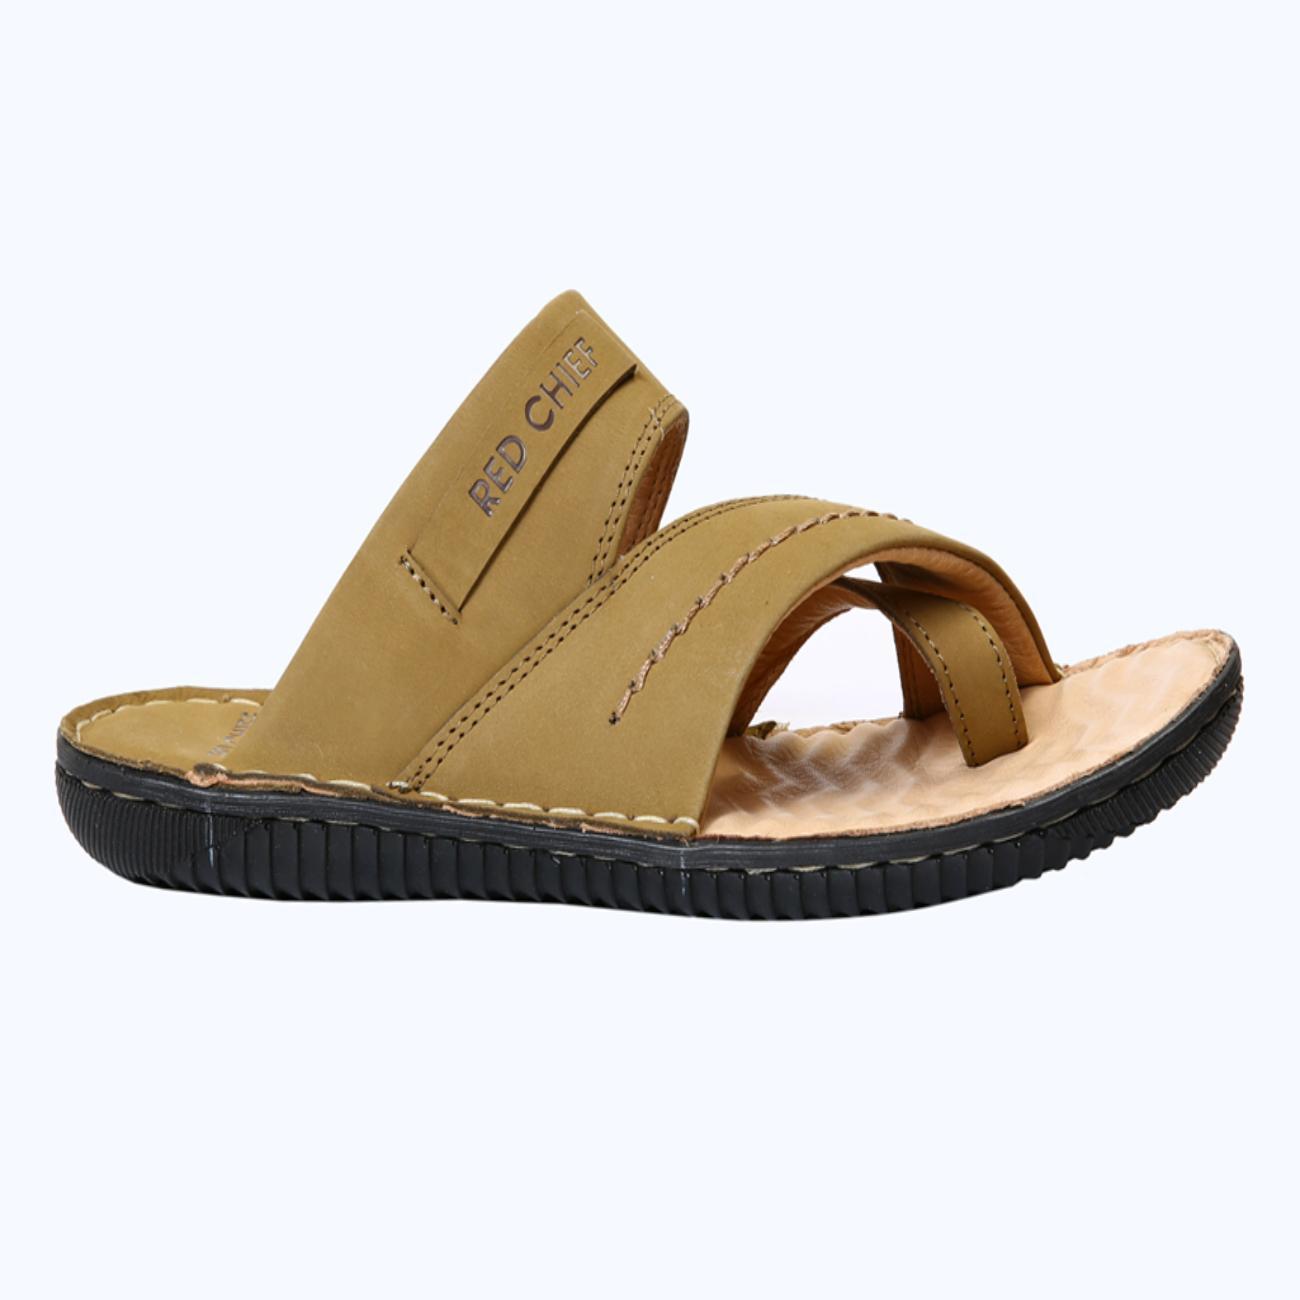 camel slip-on sandals for men